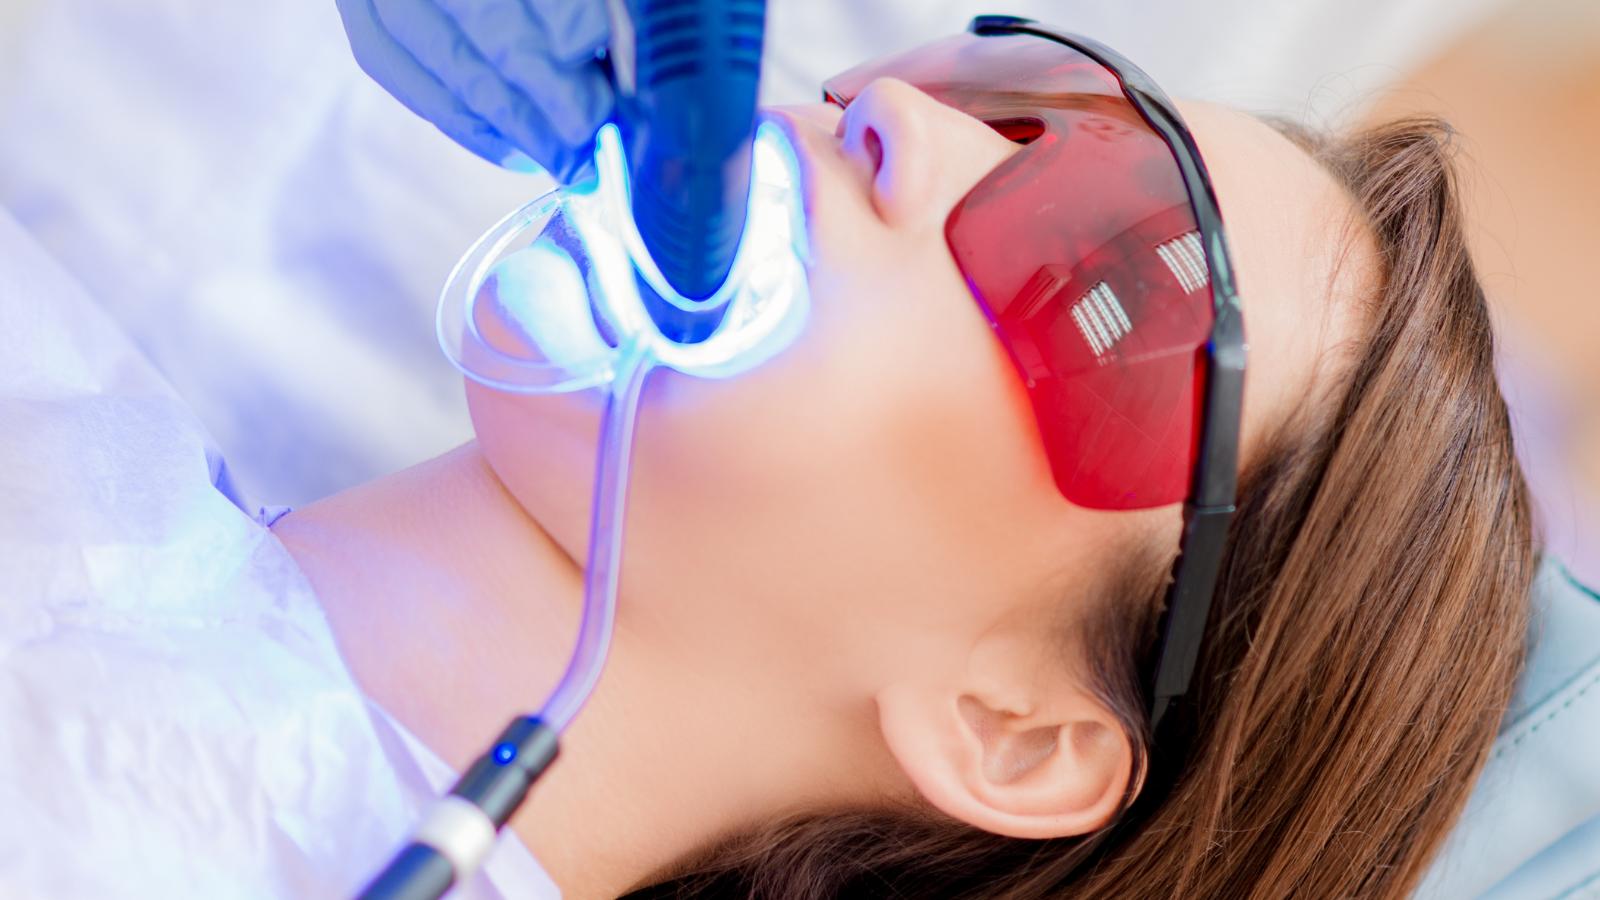 woman getting teeth whitened